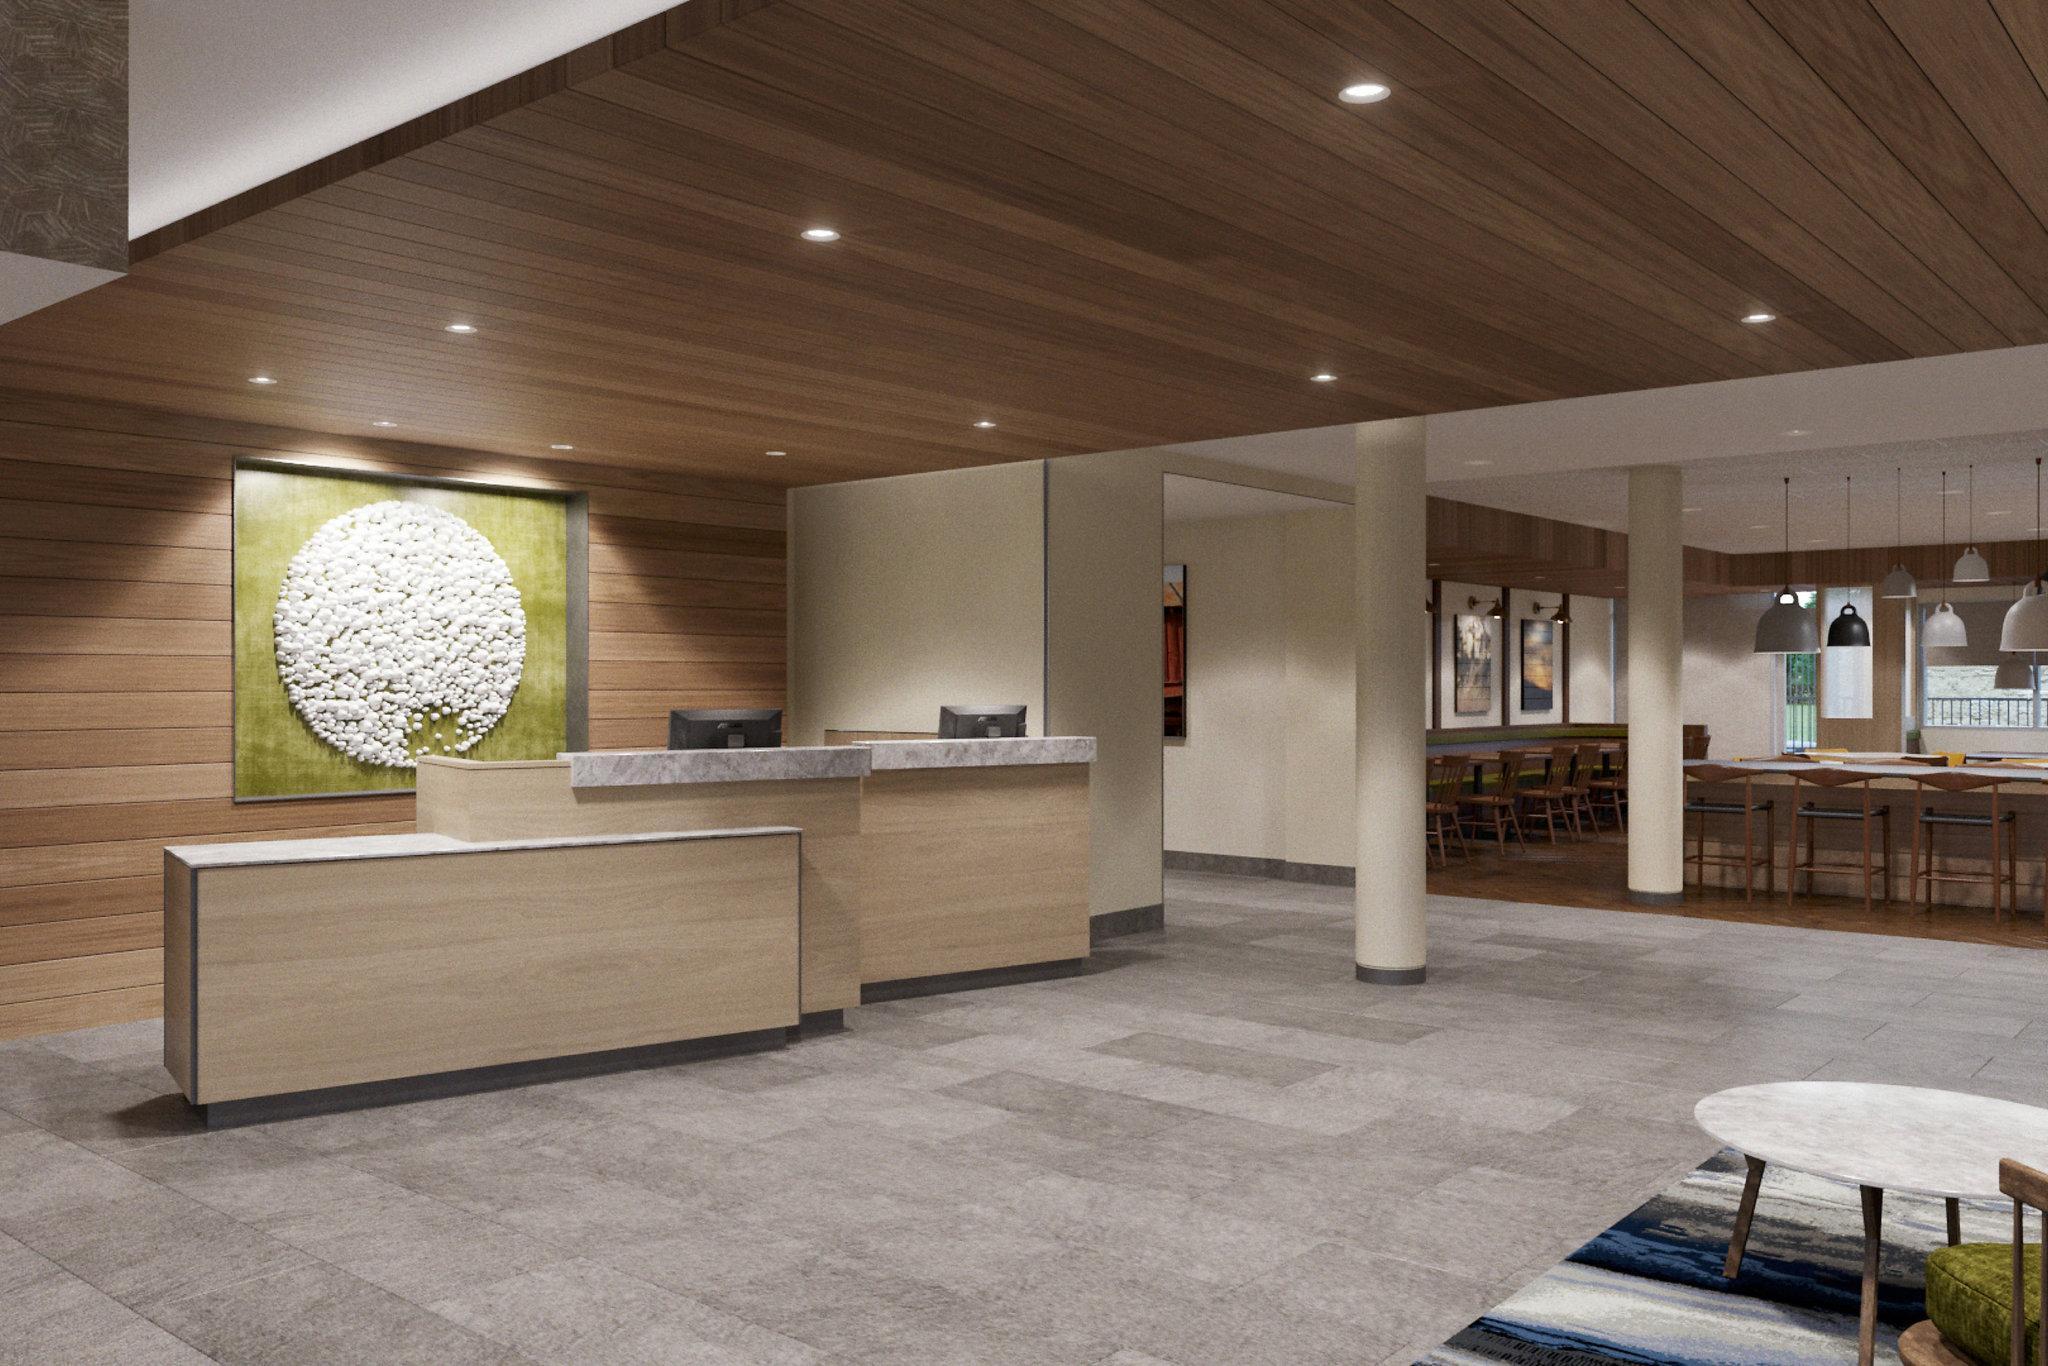 Fairfield Inn And Suites Northfield